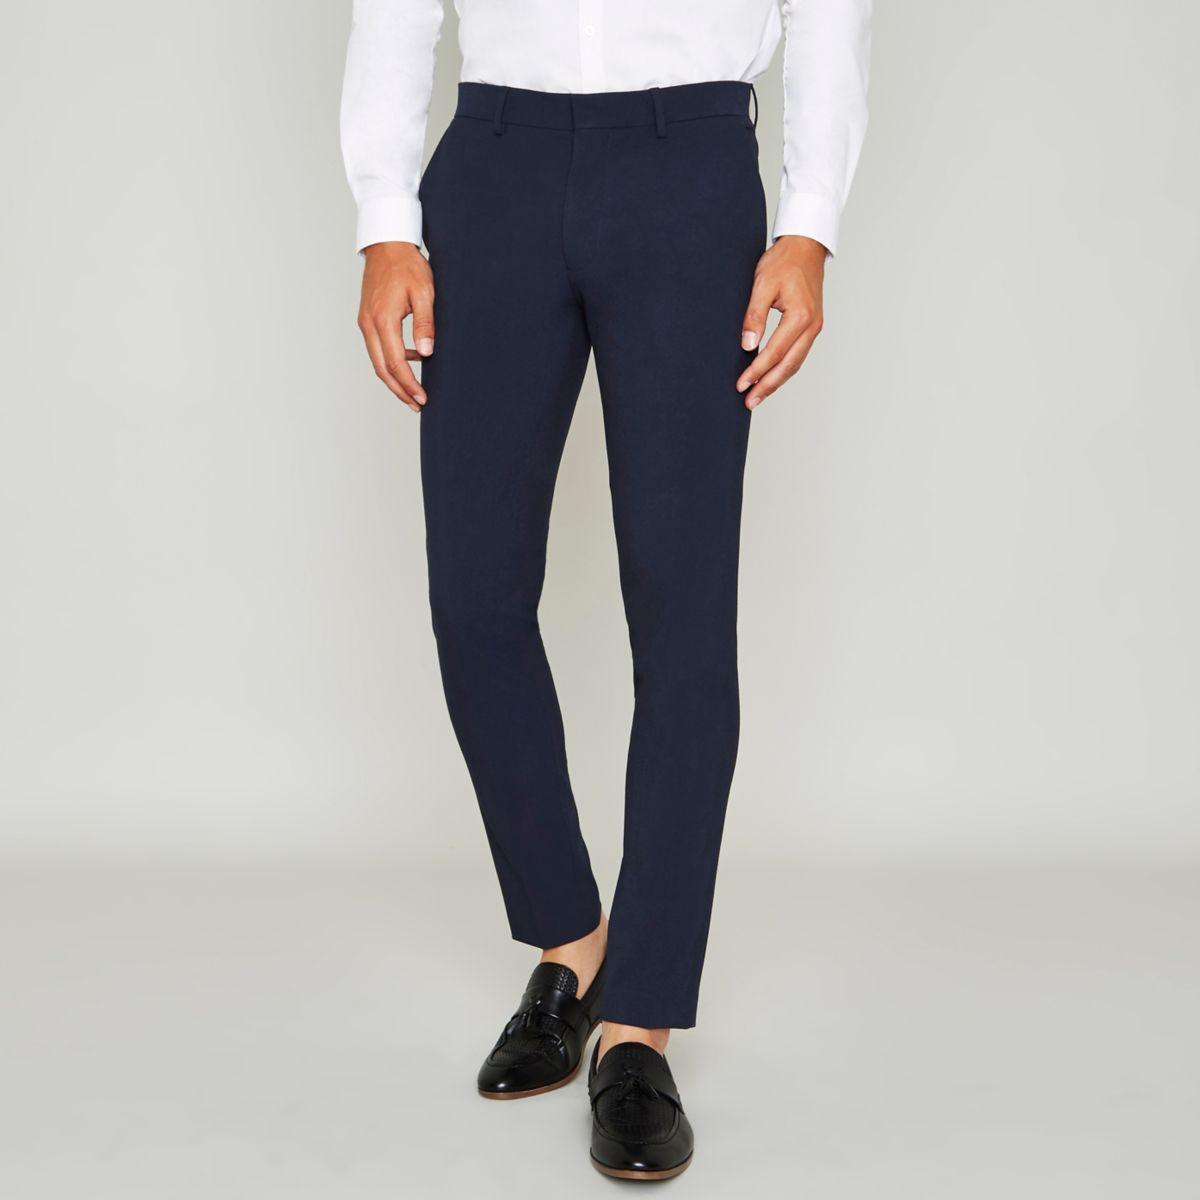 Blauwe superskinny pantalon